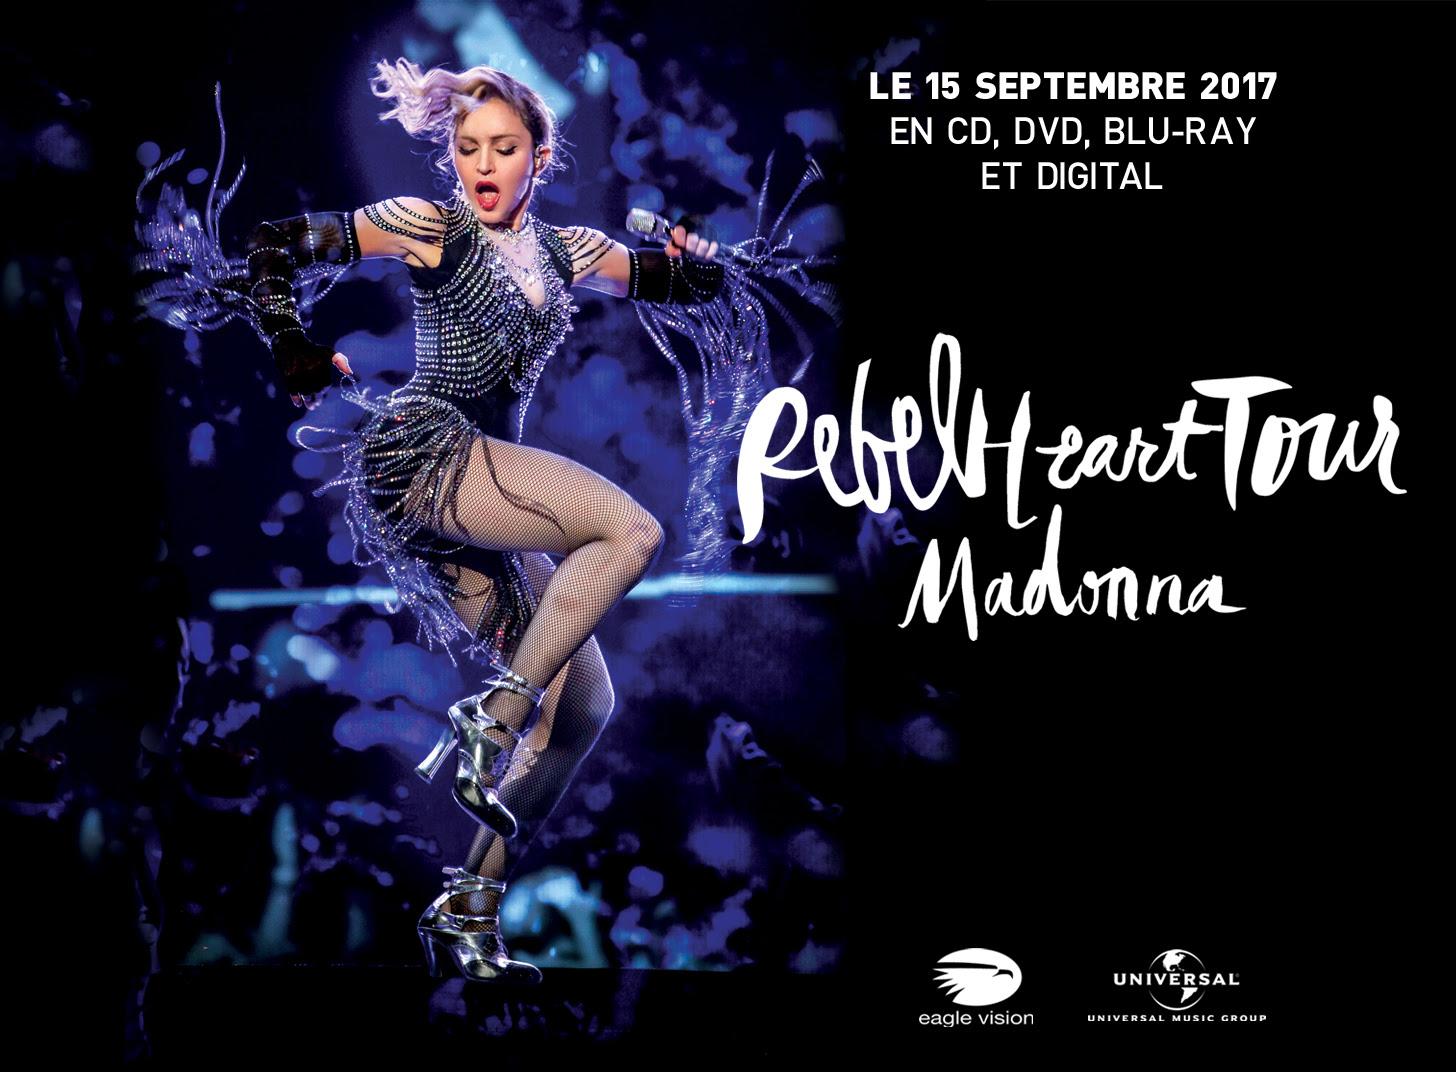 Madonna JustMusic.fr